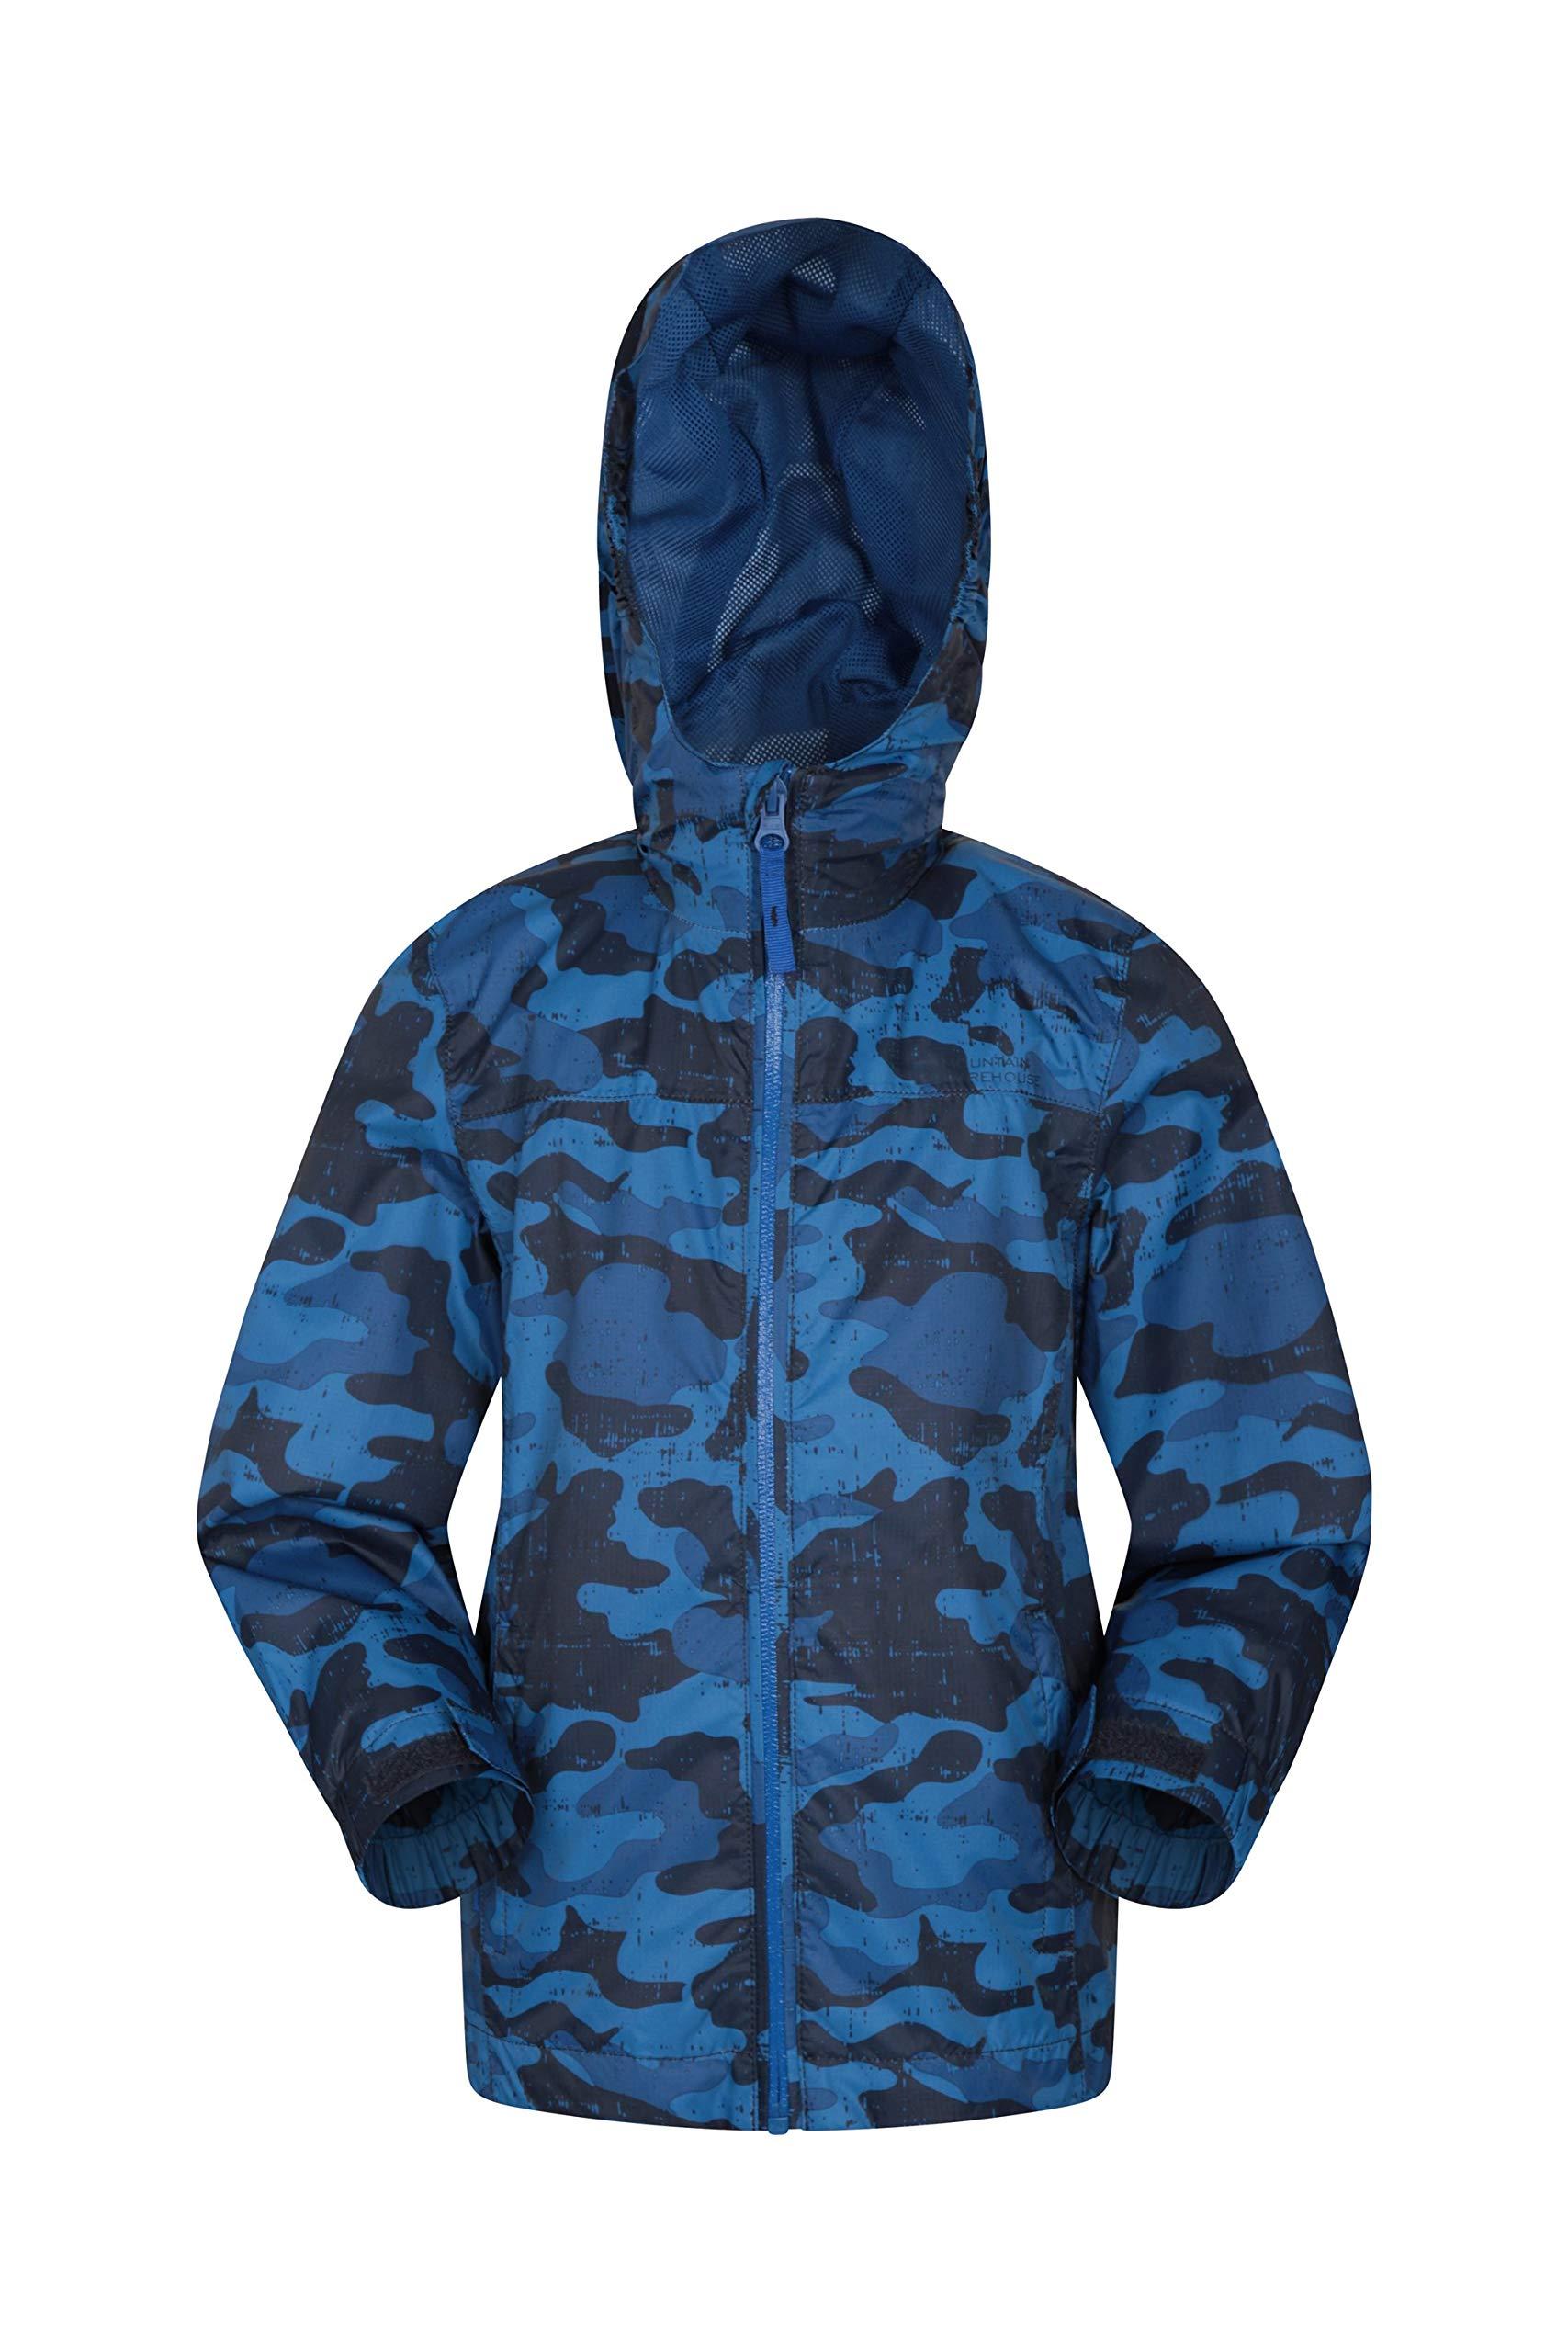 Mountain Warehouse Torrent Kids Printed Waterproof Rain Jacket Navy 5-6 Years